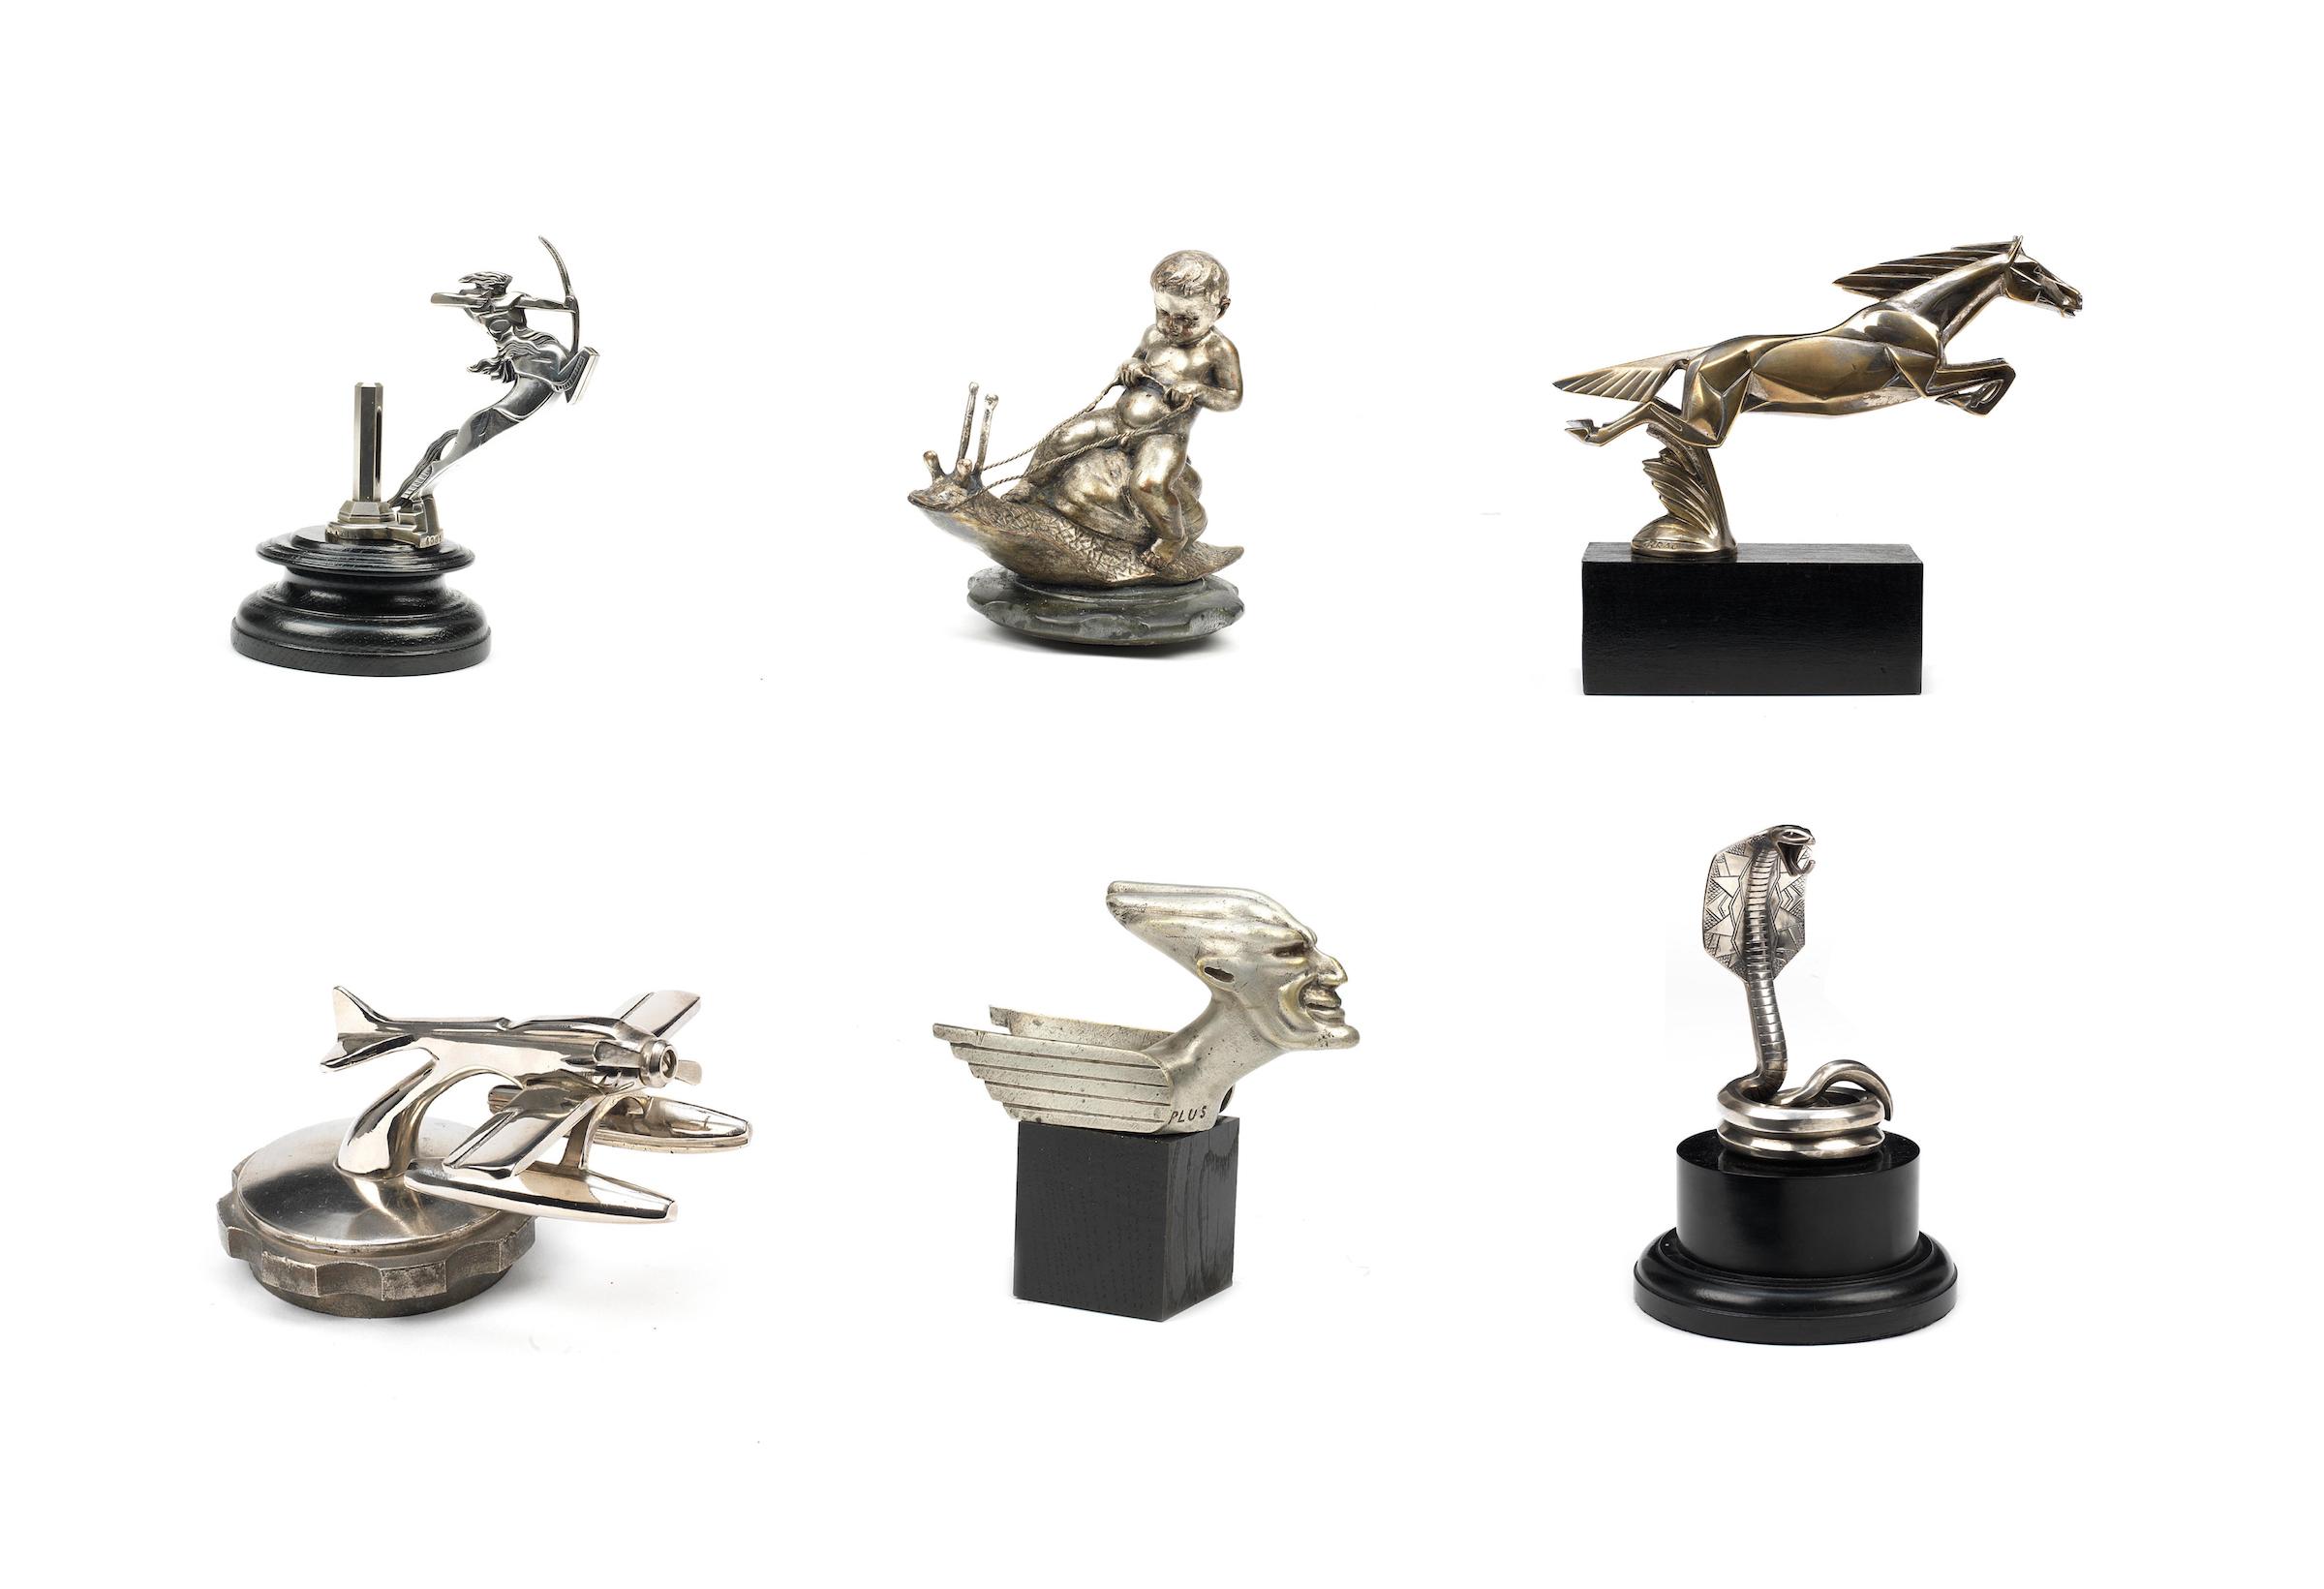 Automobile Radiator MascotS